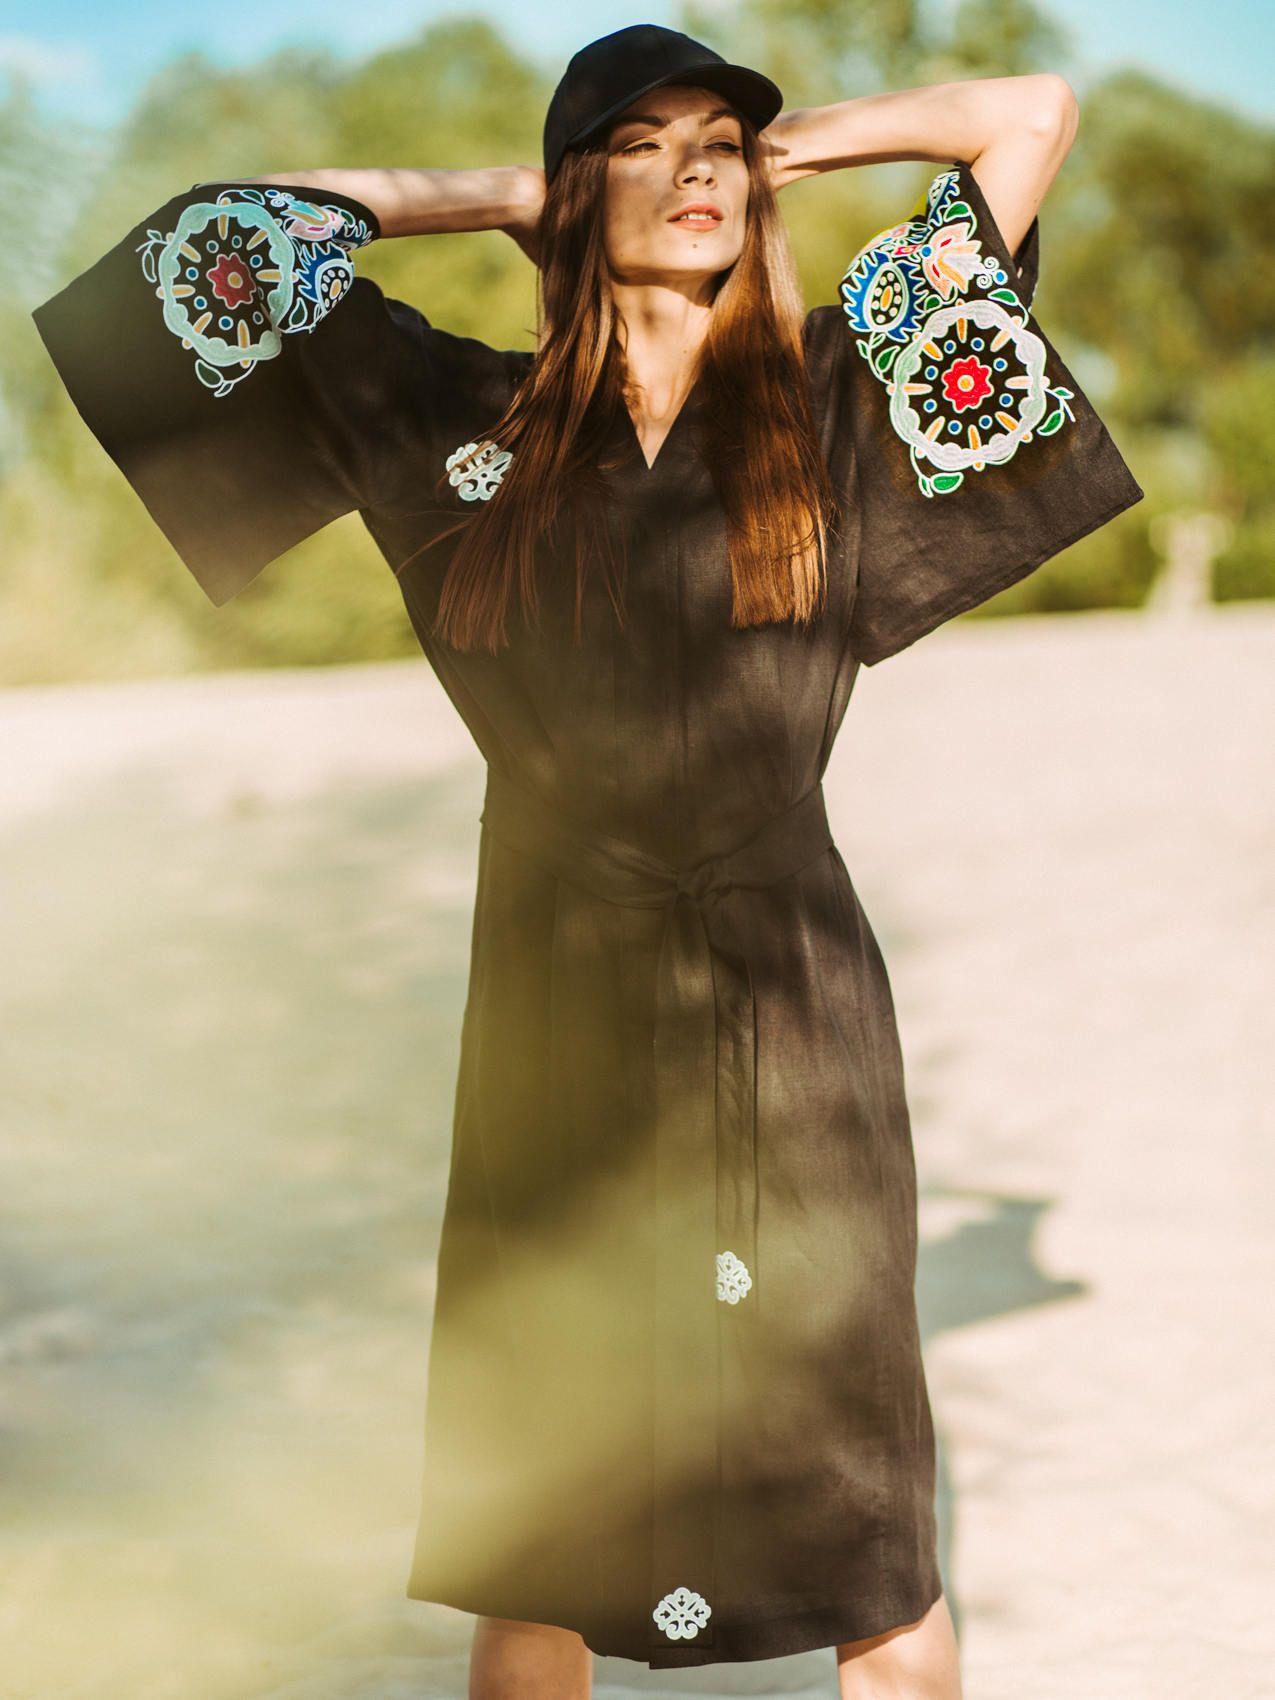 ab7f7563bb4 Black embroidered kimono dress with flowers Ukrainian vyshyvanka Linen dress  Boho Satin stitch embroidery Folk floral pattern Gift